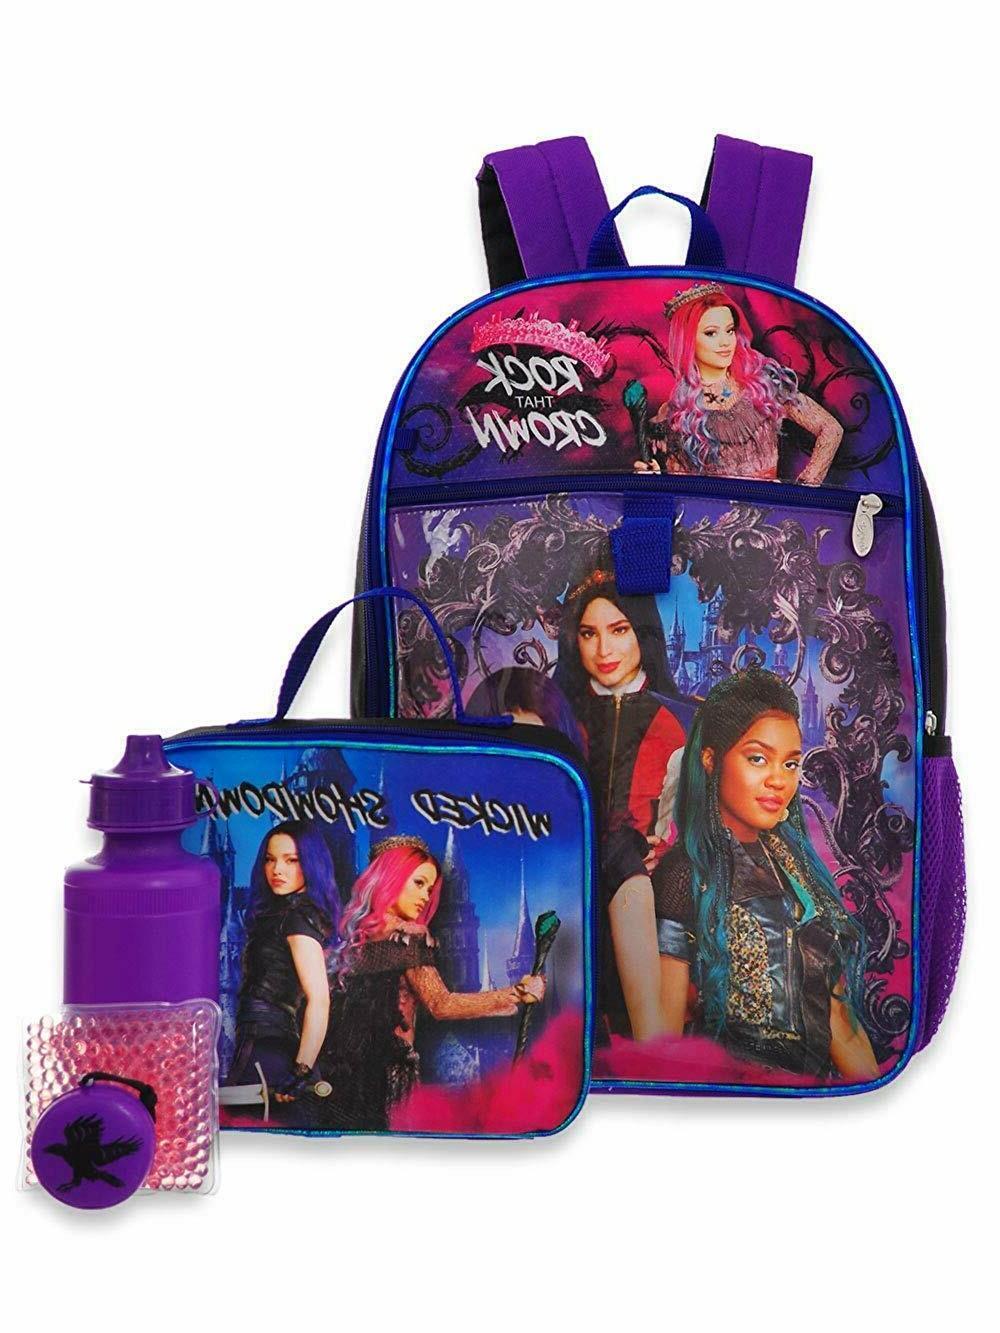 Disney Descendants Girl School Backpack Lunch Box Book Bag 5 Piece Set Toy Gift